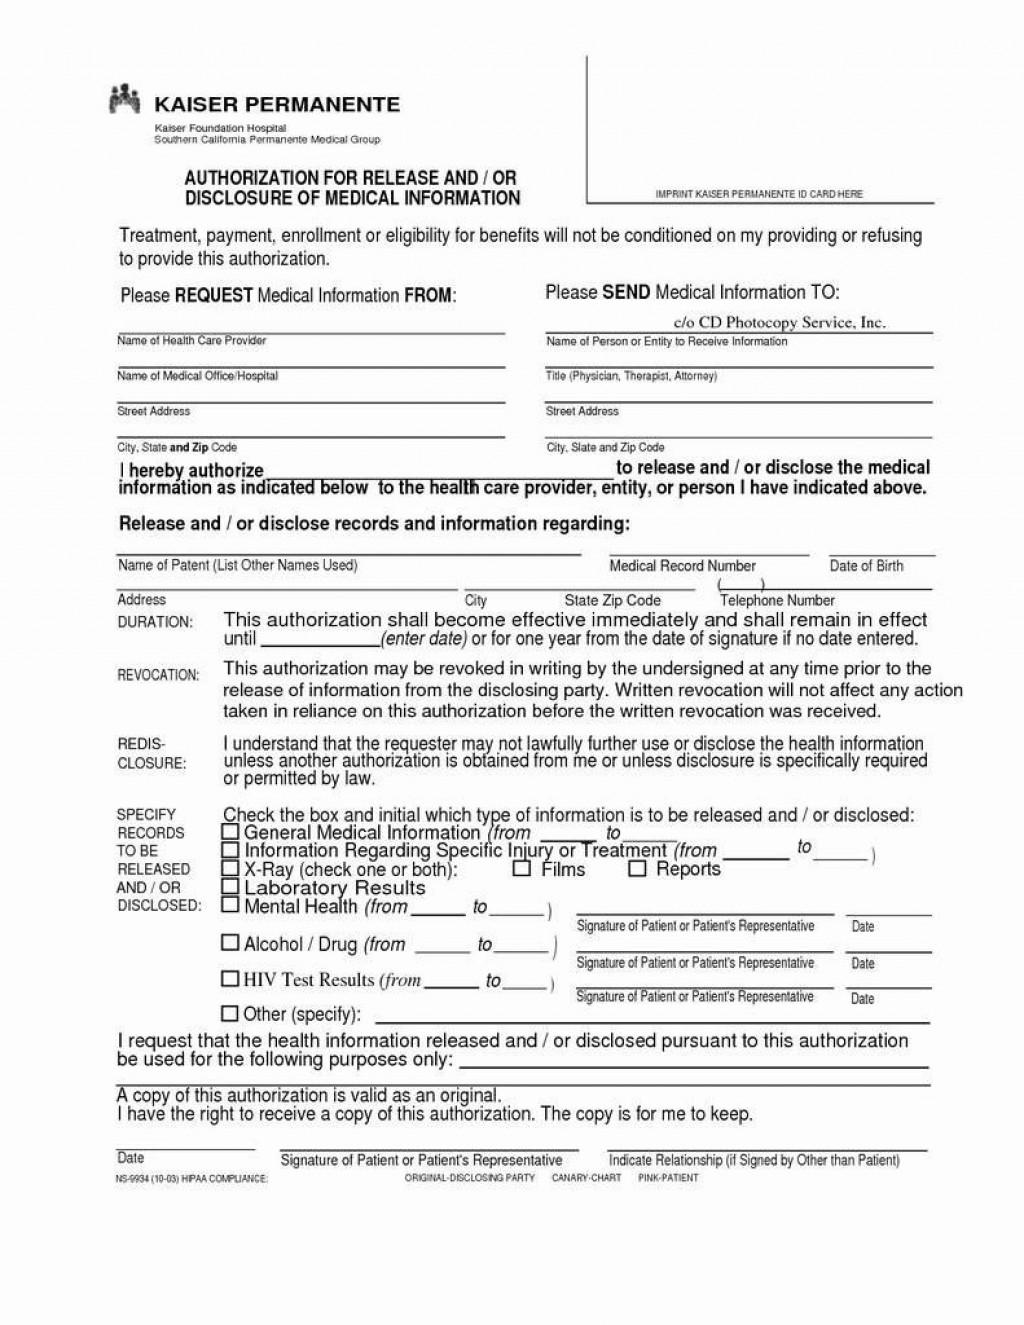 007 Wonderful Free Hospital Discharge Form Template Inspiration Large